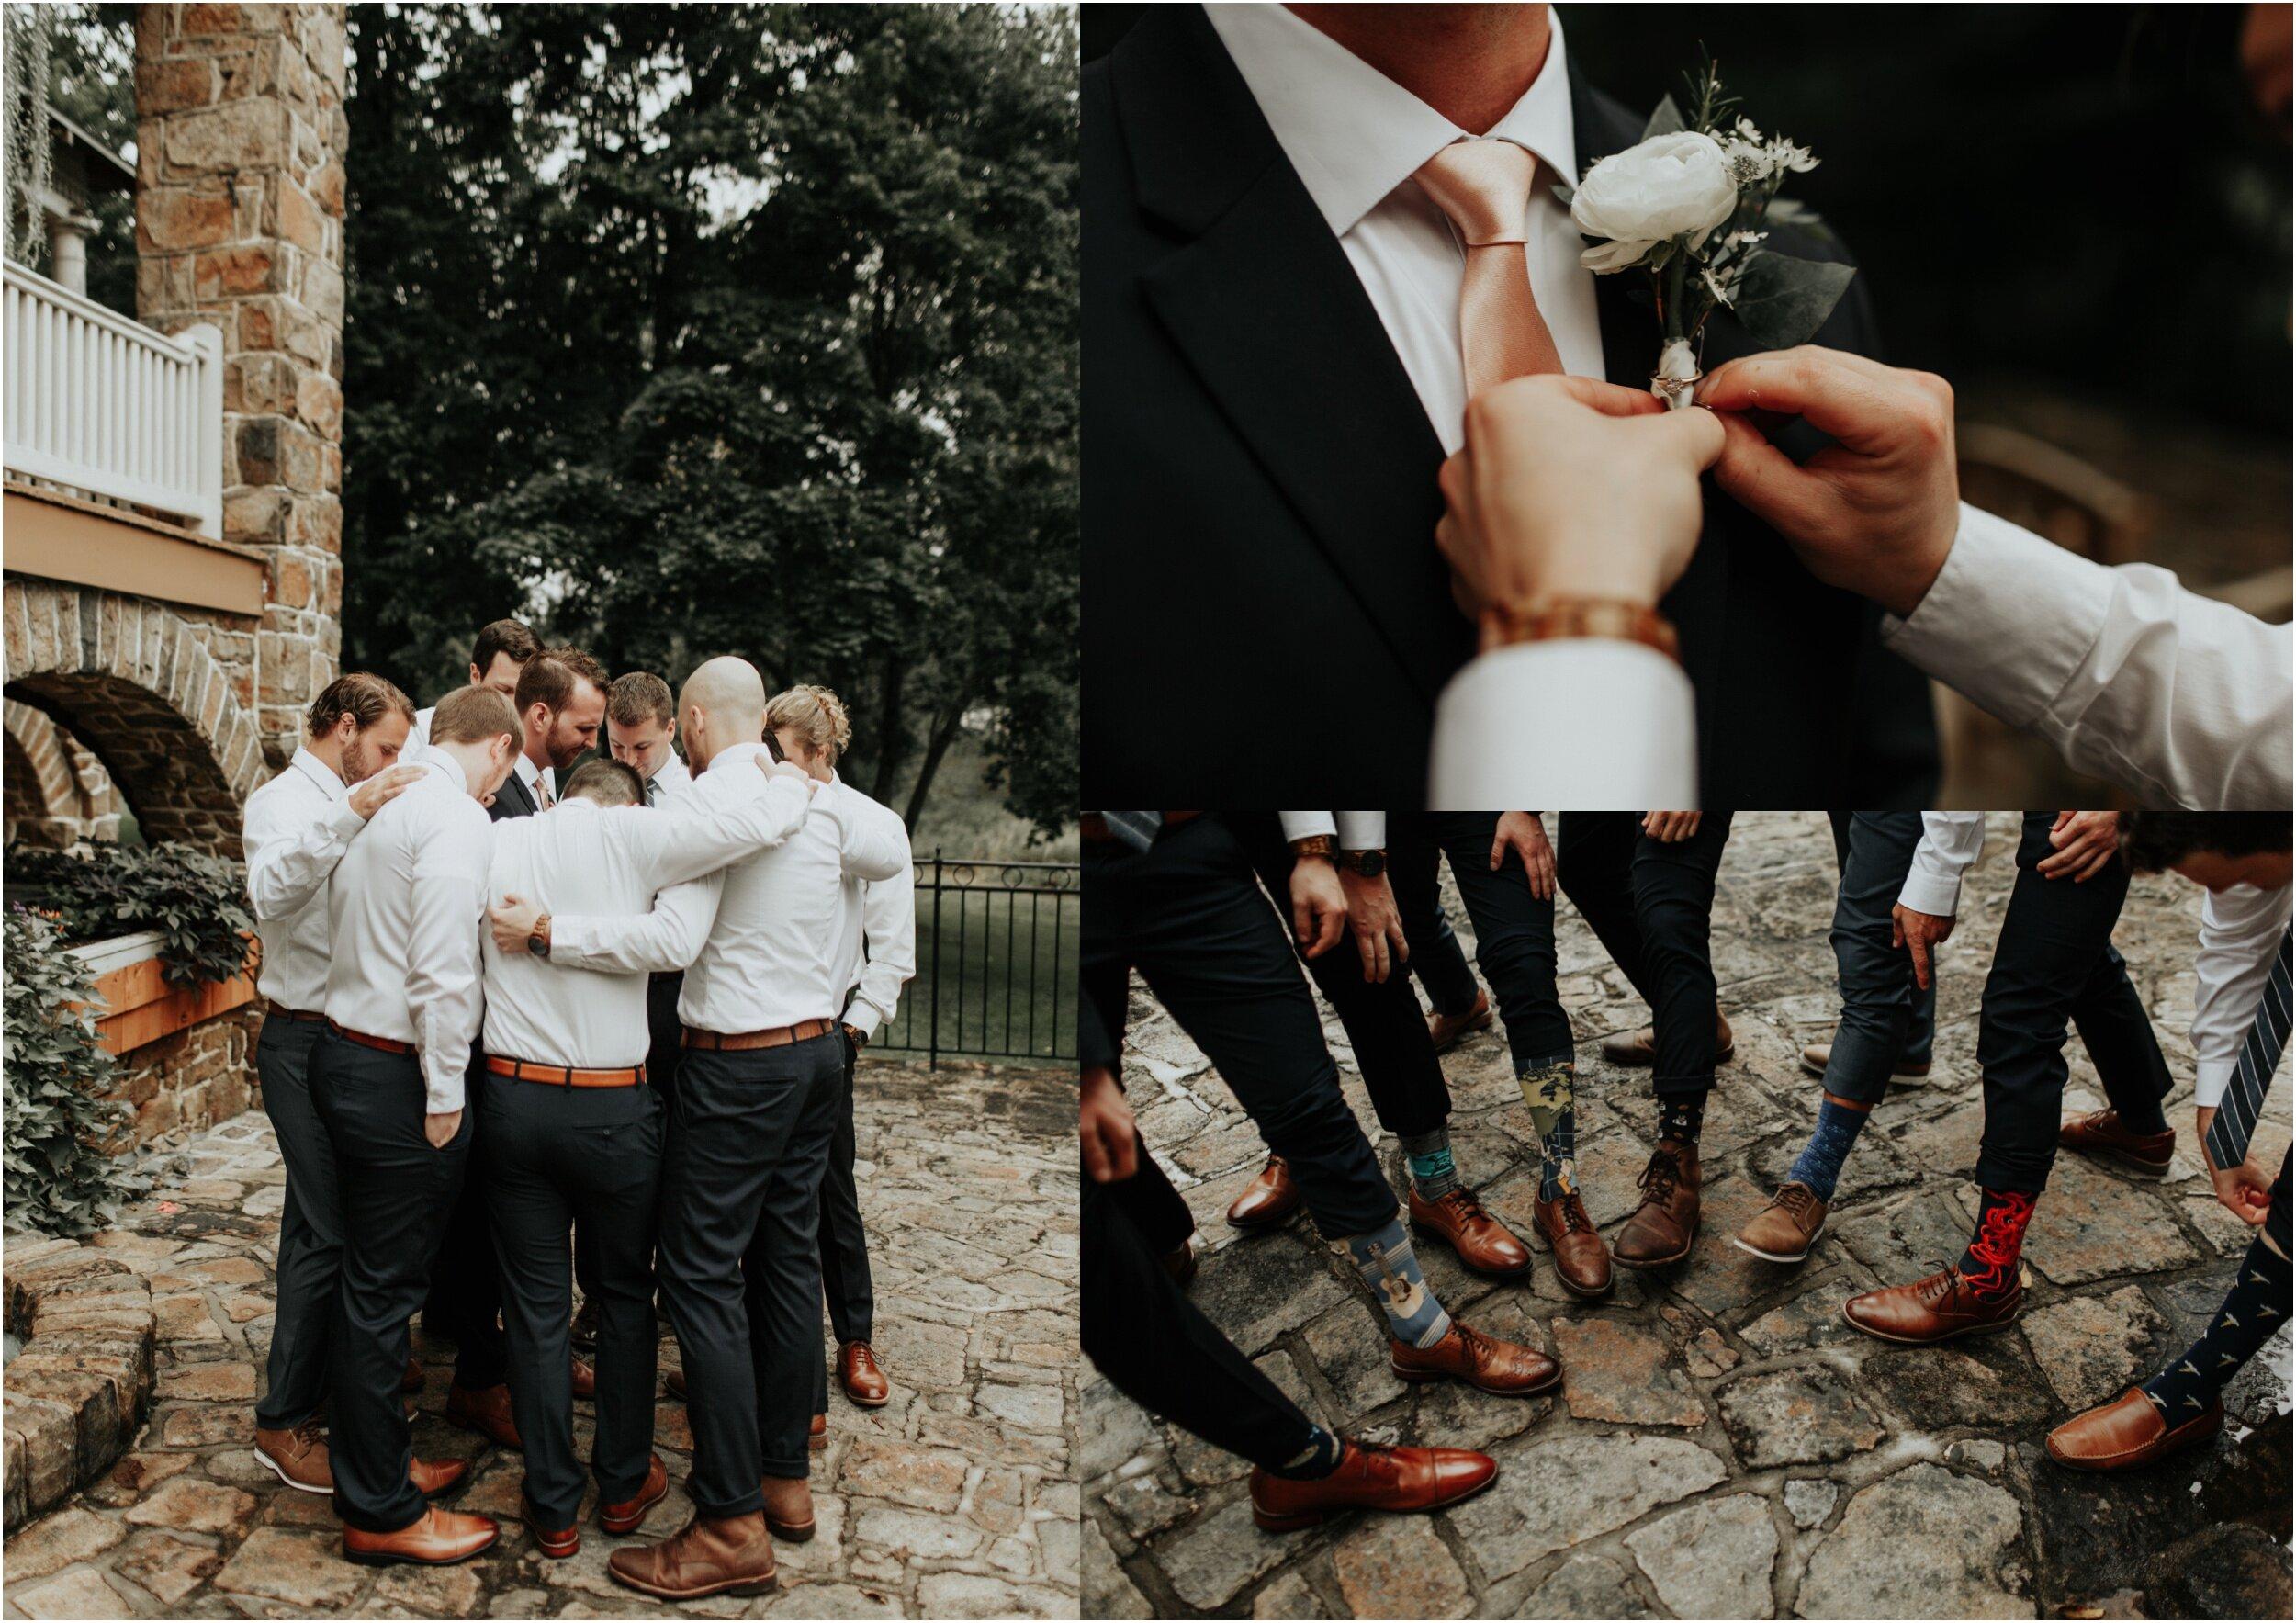 steph-and-jordan-cox-our-wedding-historic-shady-lane-compass-wedding-collective-hazel-lining-photography-destination-elopement-wedding-engagement-photography_0028.jpg